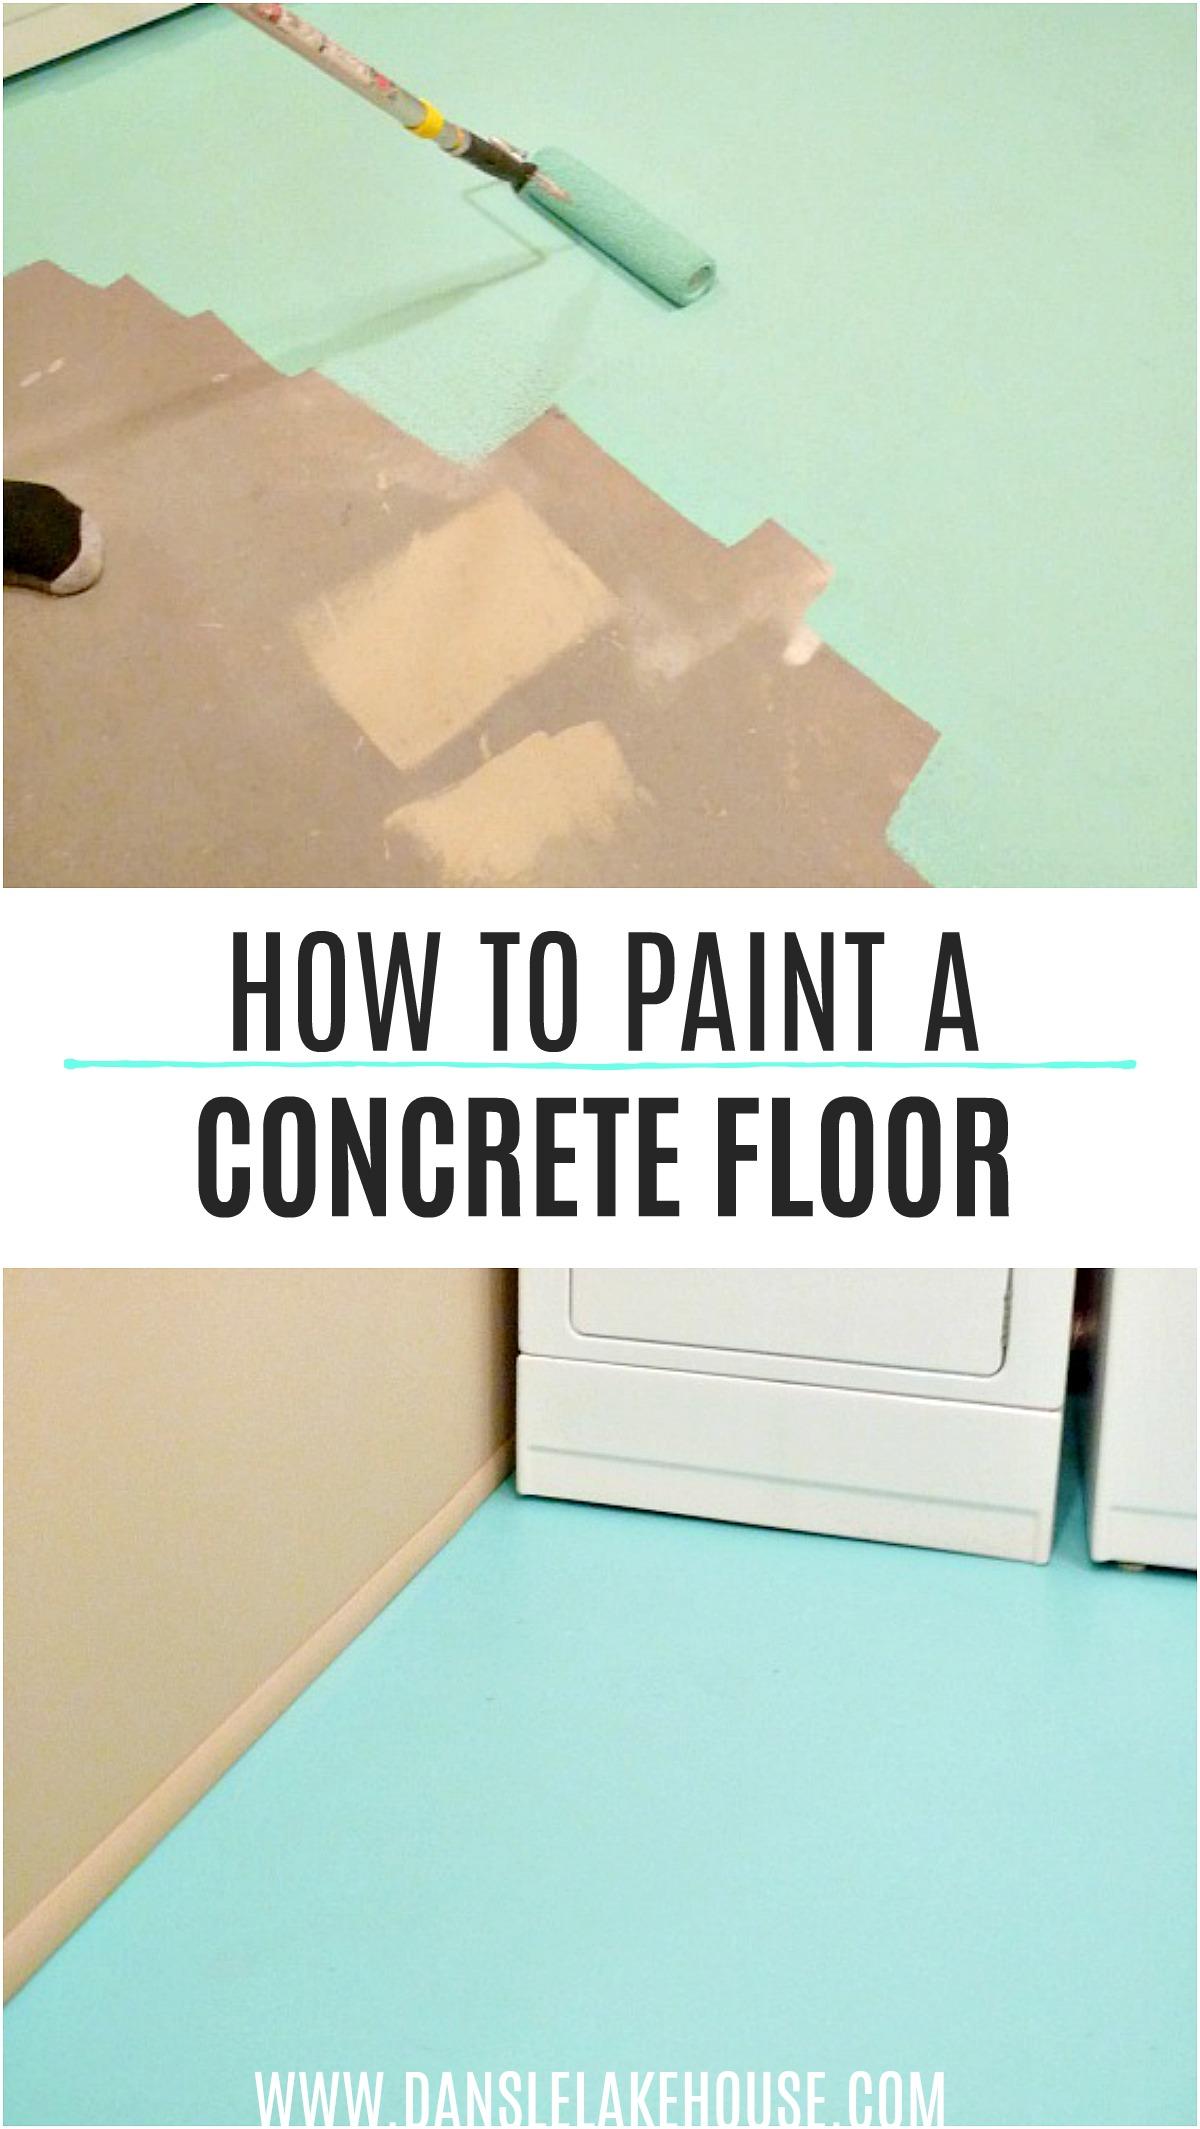 How to Paint a Concrete Floor